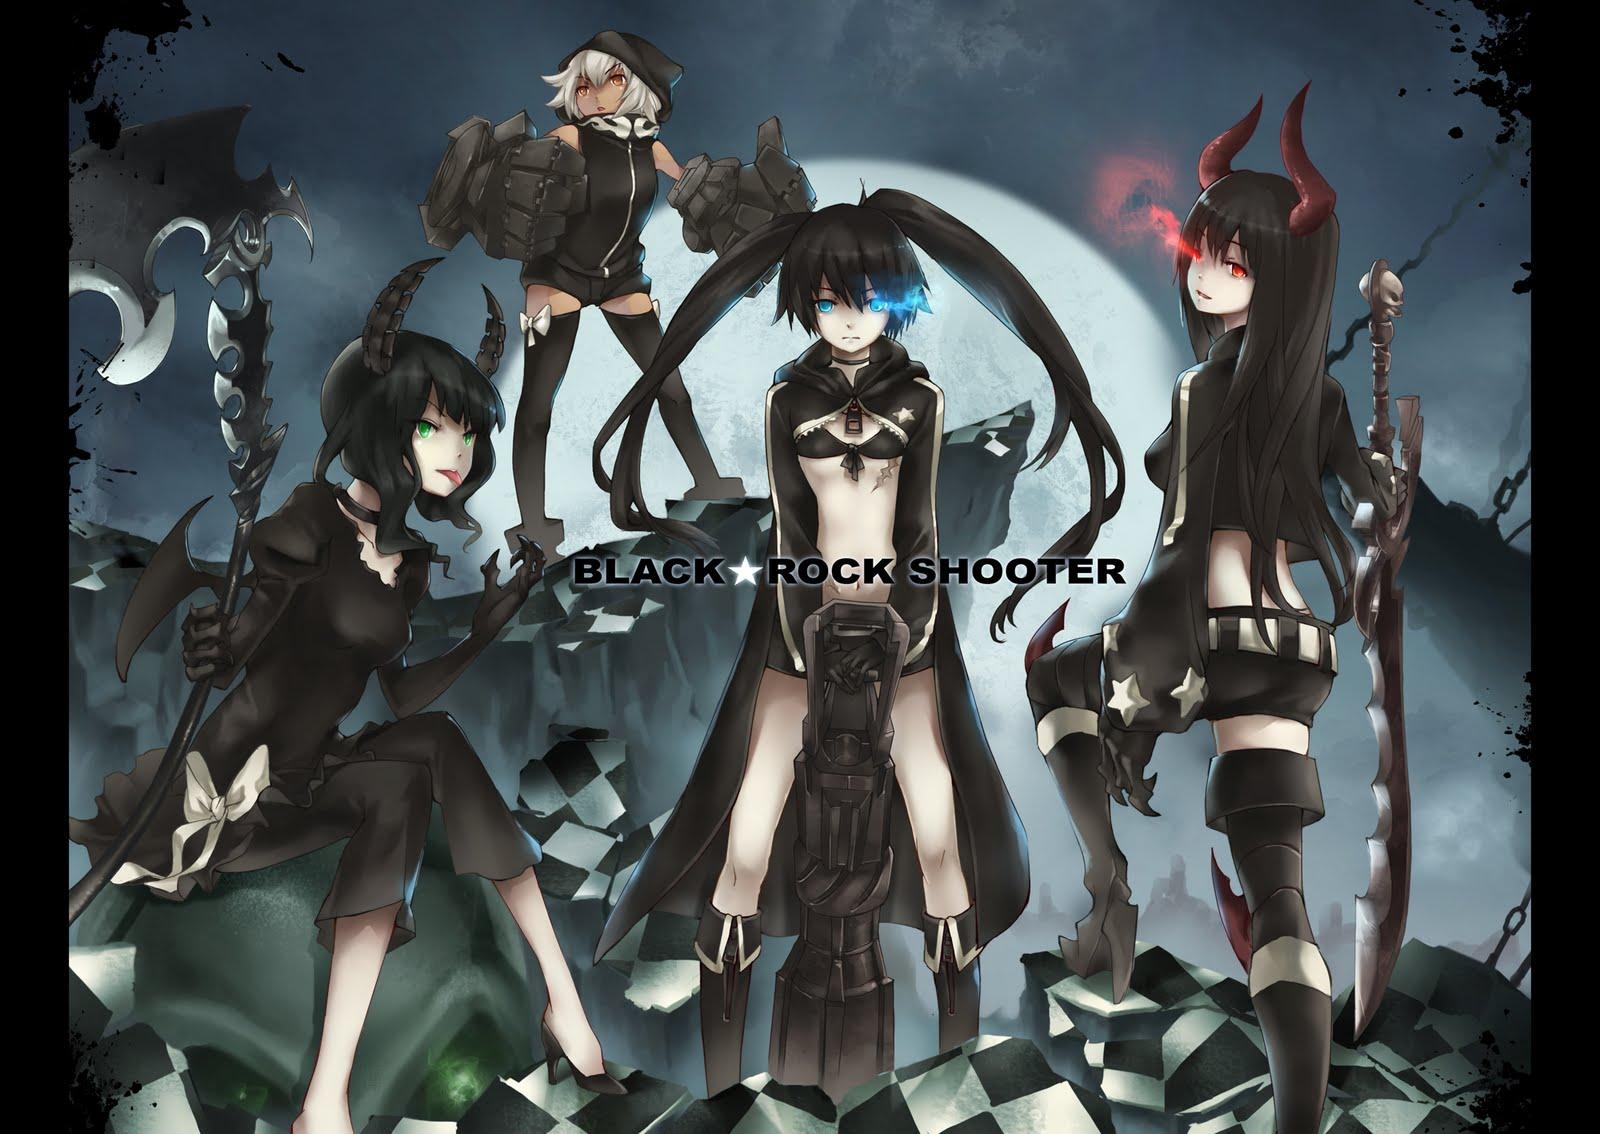 http://3.bp.blogspot.com/-hYY1c2v3caE/TnKVFEZsmcI/AAAAAAAABXg/9LoSnEyrzXw/s1600/konachan-com-83094-black_gold_saw-black_rock_shooter-kuroi_mato-takanashi_yomi-yuu.jpg